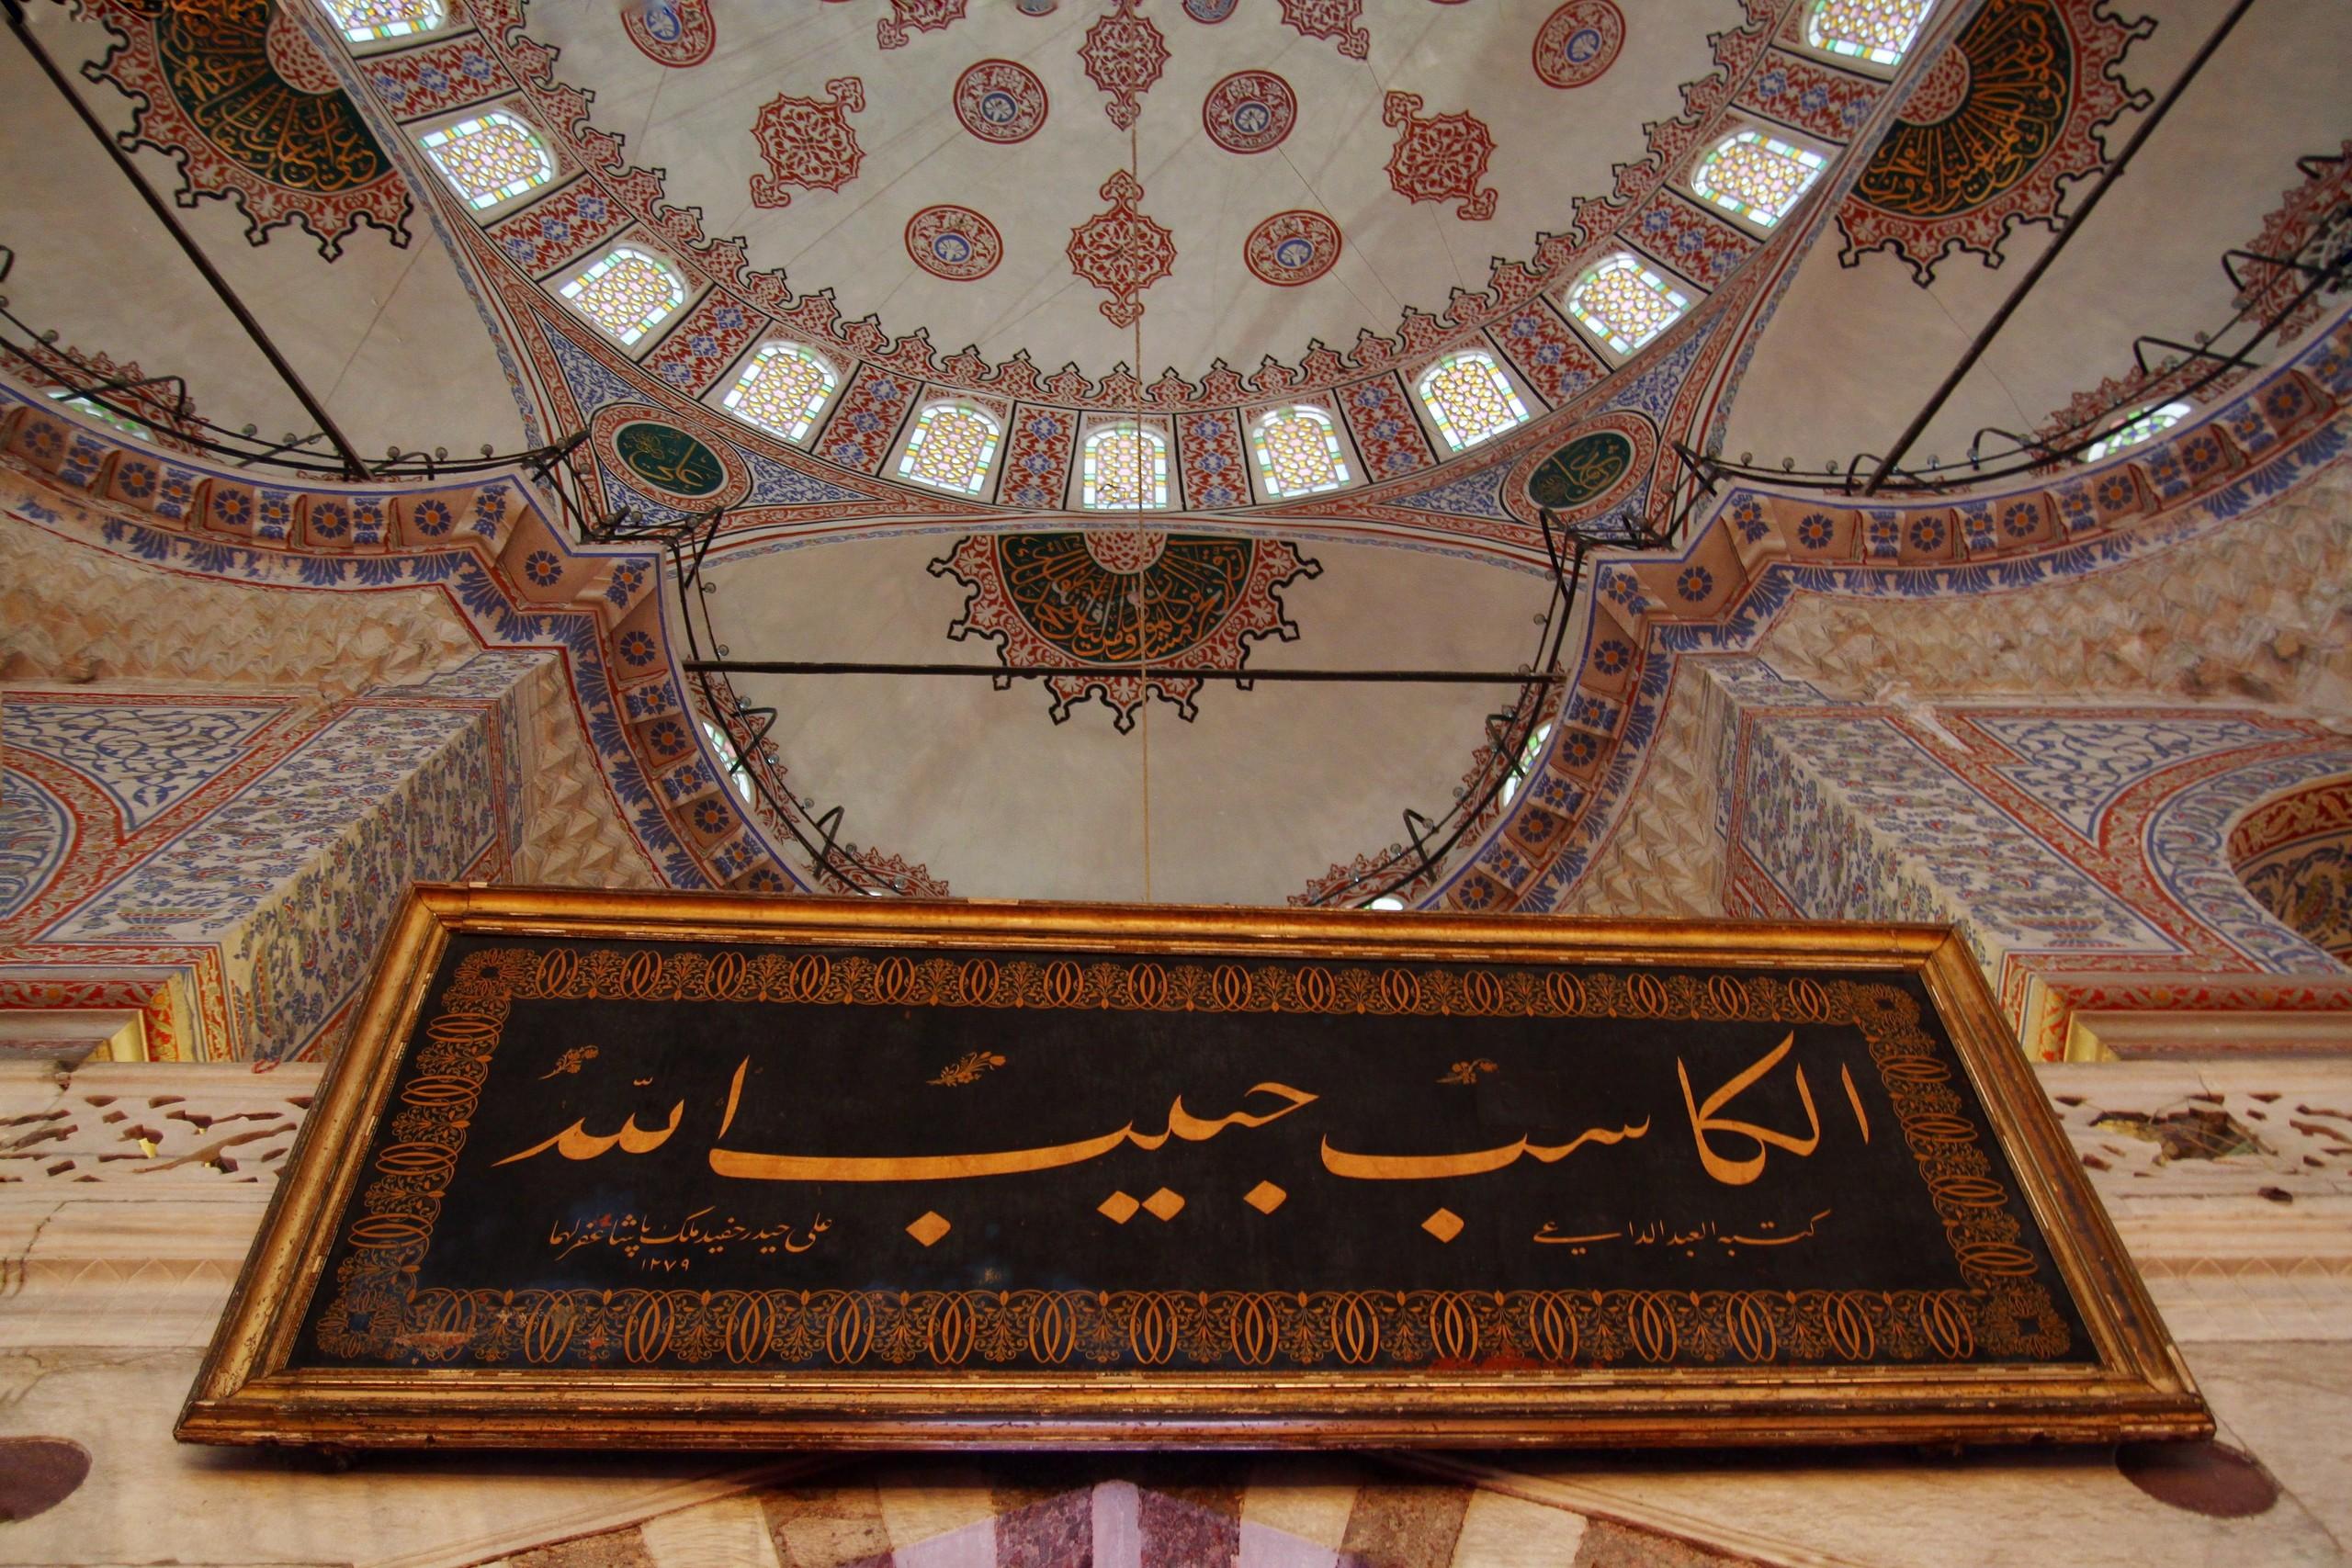 Pırlantadan Kubbeler #5: Sultanahmed - qBQrqQ - Pırlantadan Kubbeler #5: Sultanahmed